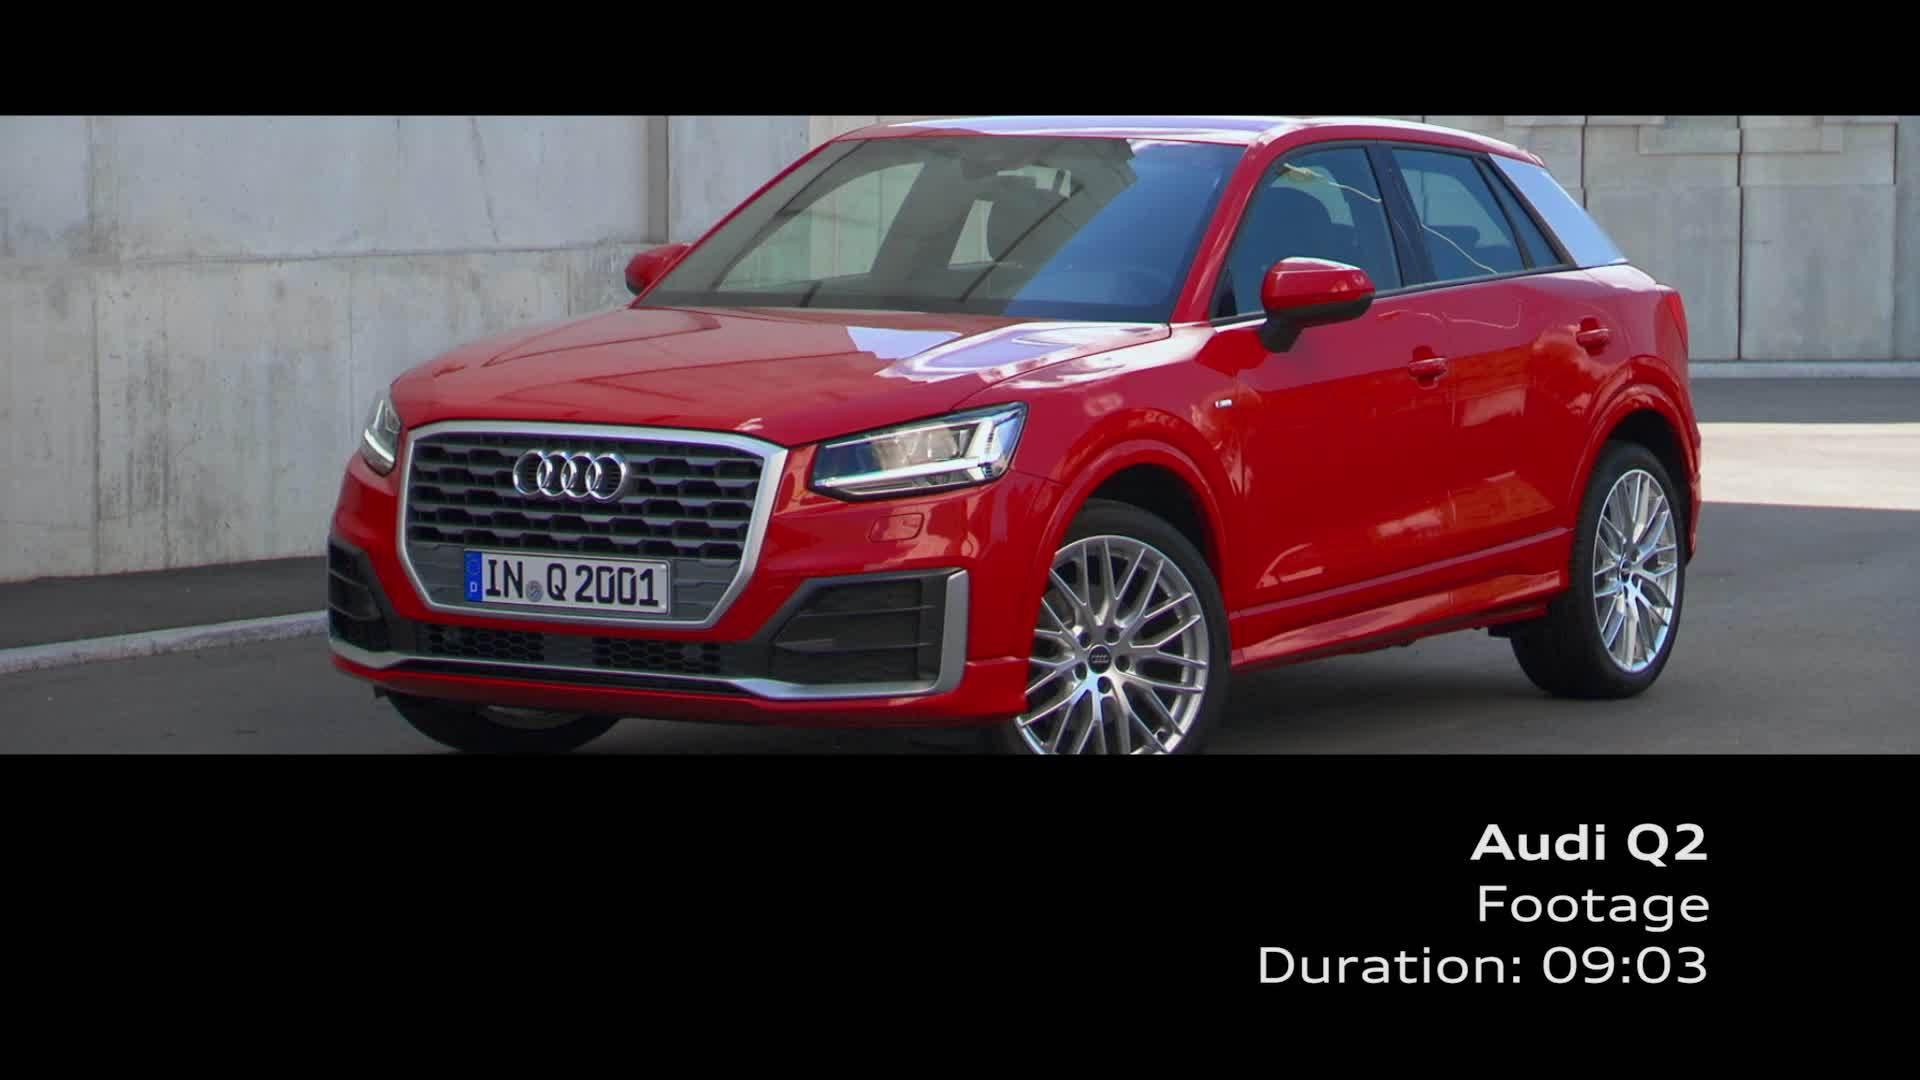 Audi Q2 - Footage on Location, Tangorot